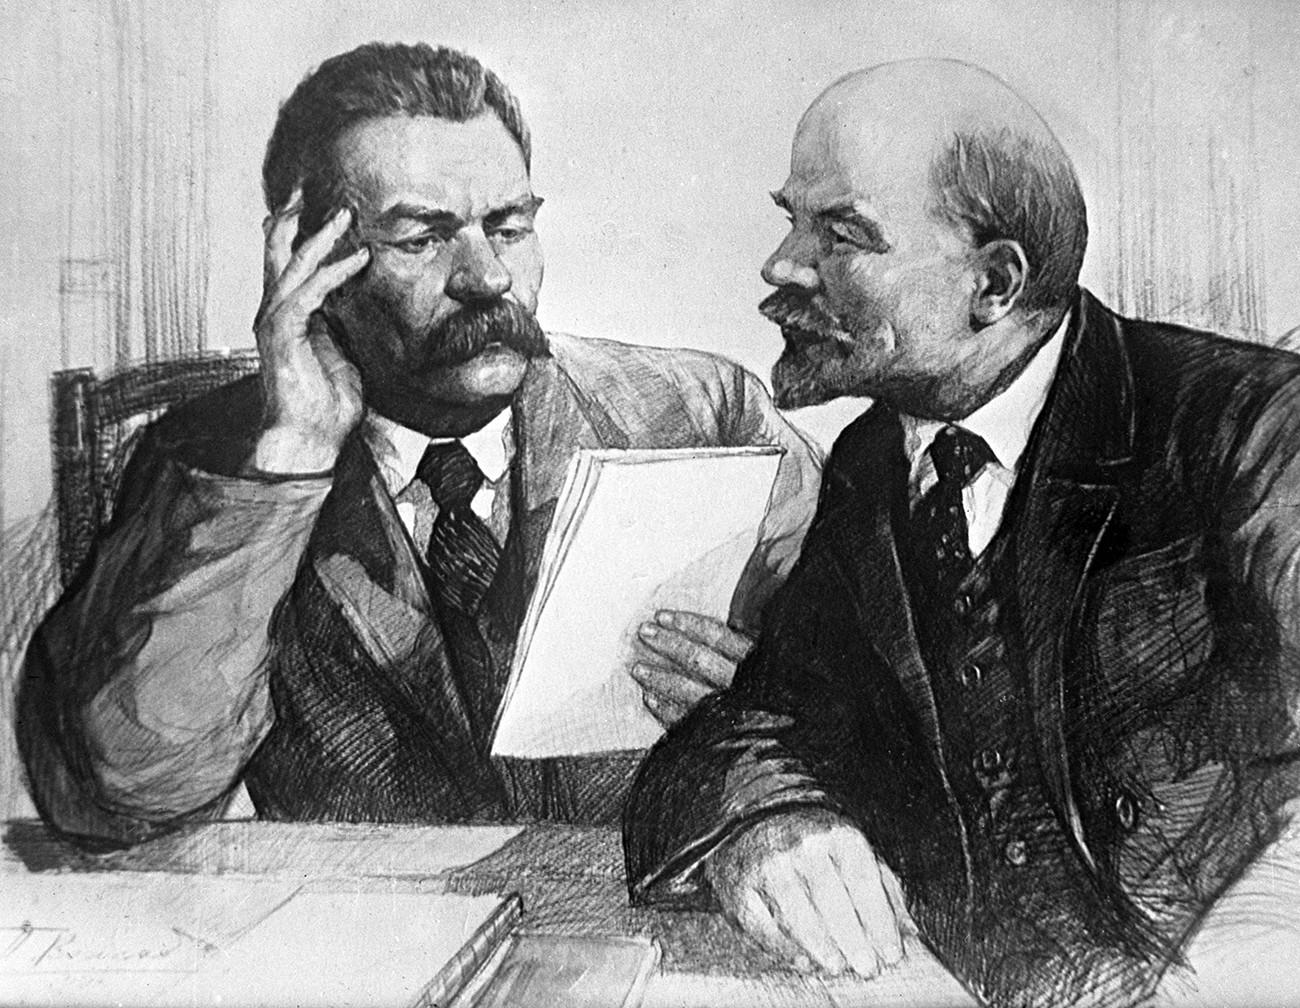 Максим Горки (лево) и Владимир Лењин. Репродукција.